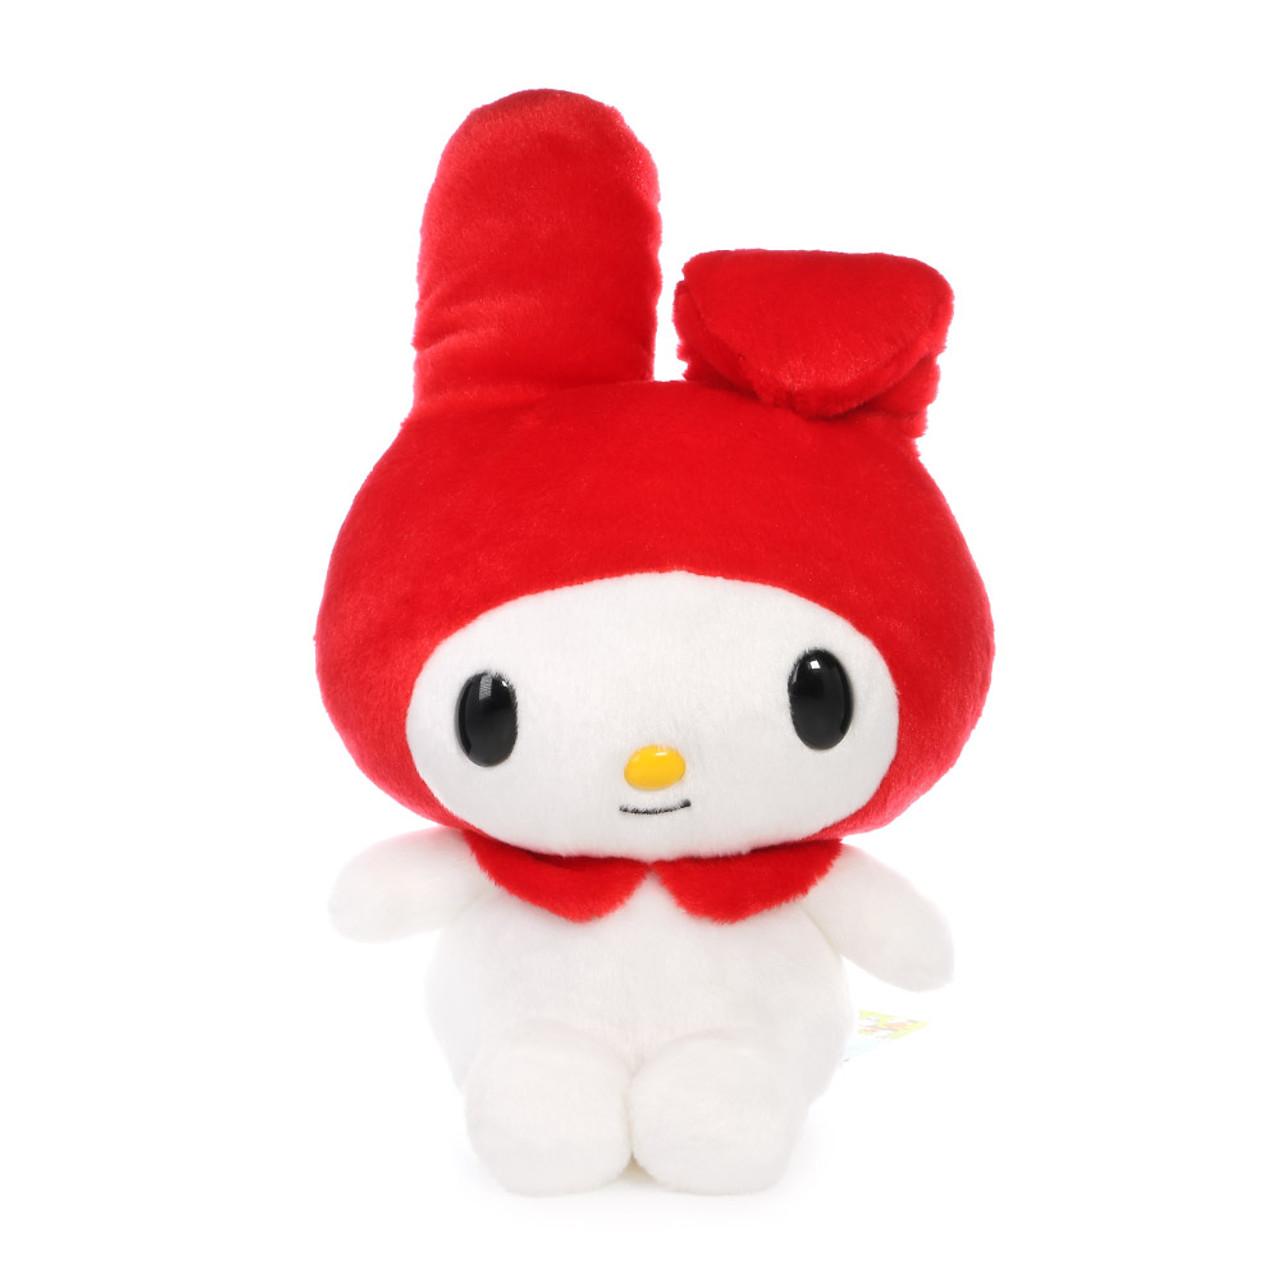 "Sanrio My Melody Plush Keychain 3.5"" Red"